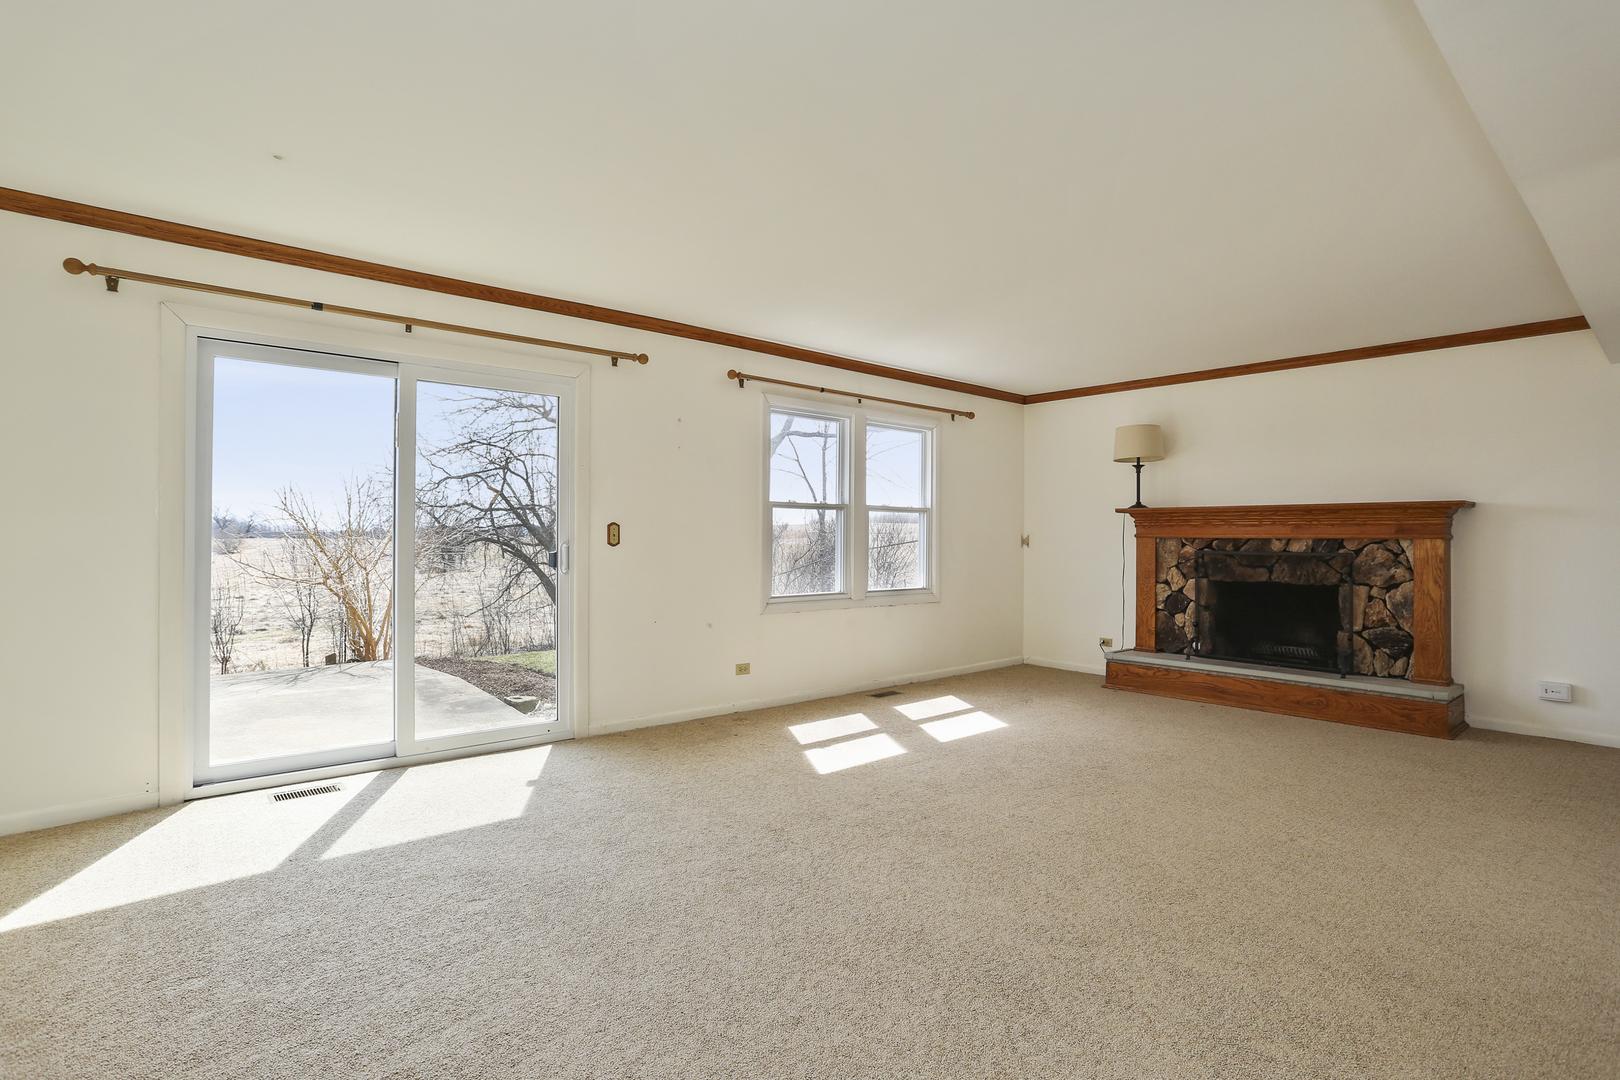 1799 Burr Ridge, HOFFMAN ESTATES, Illinois, 60192